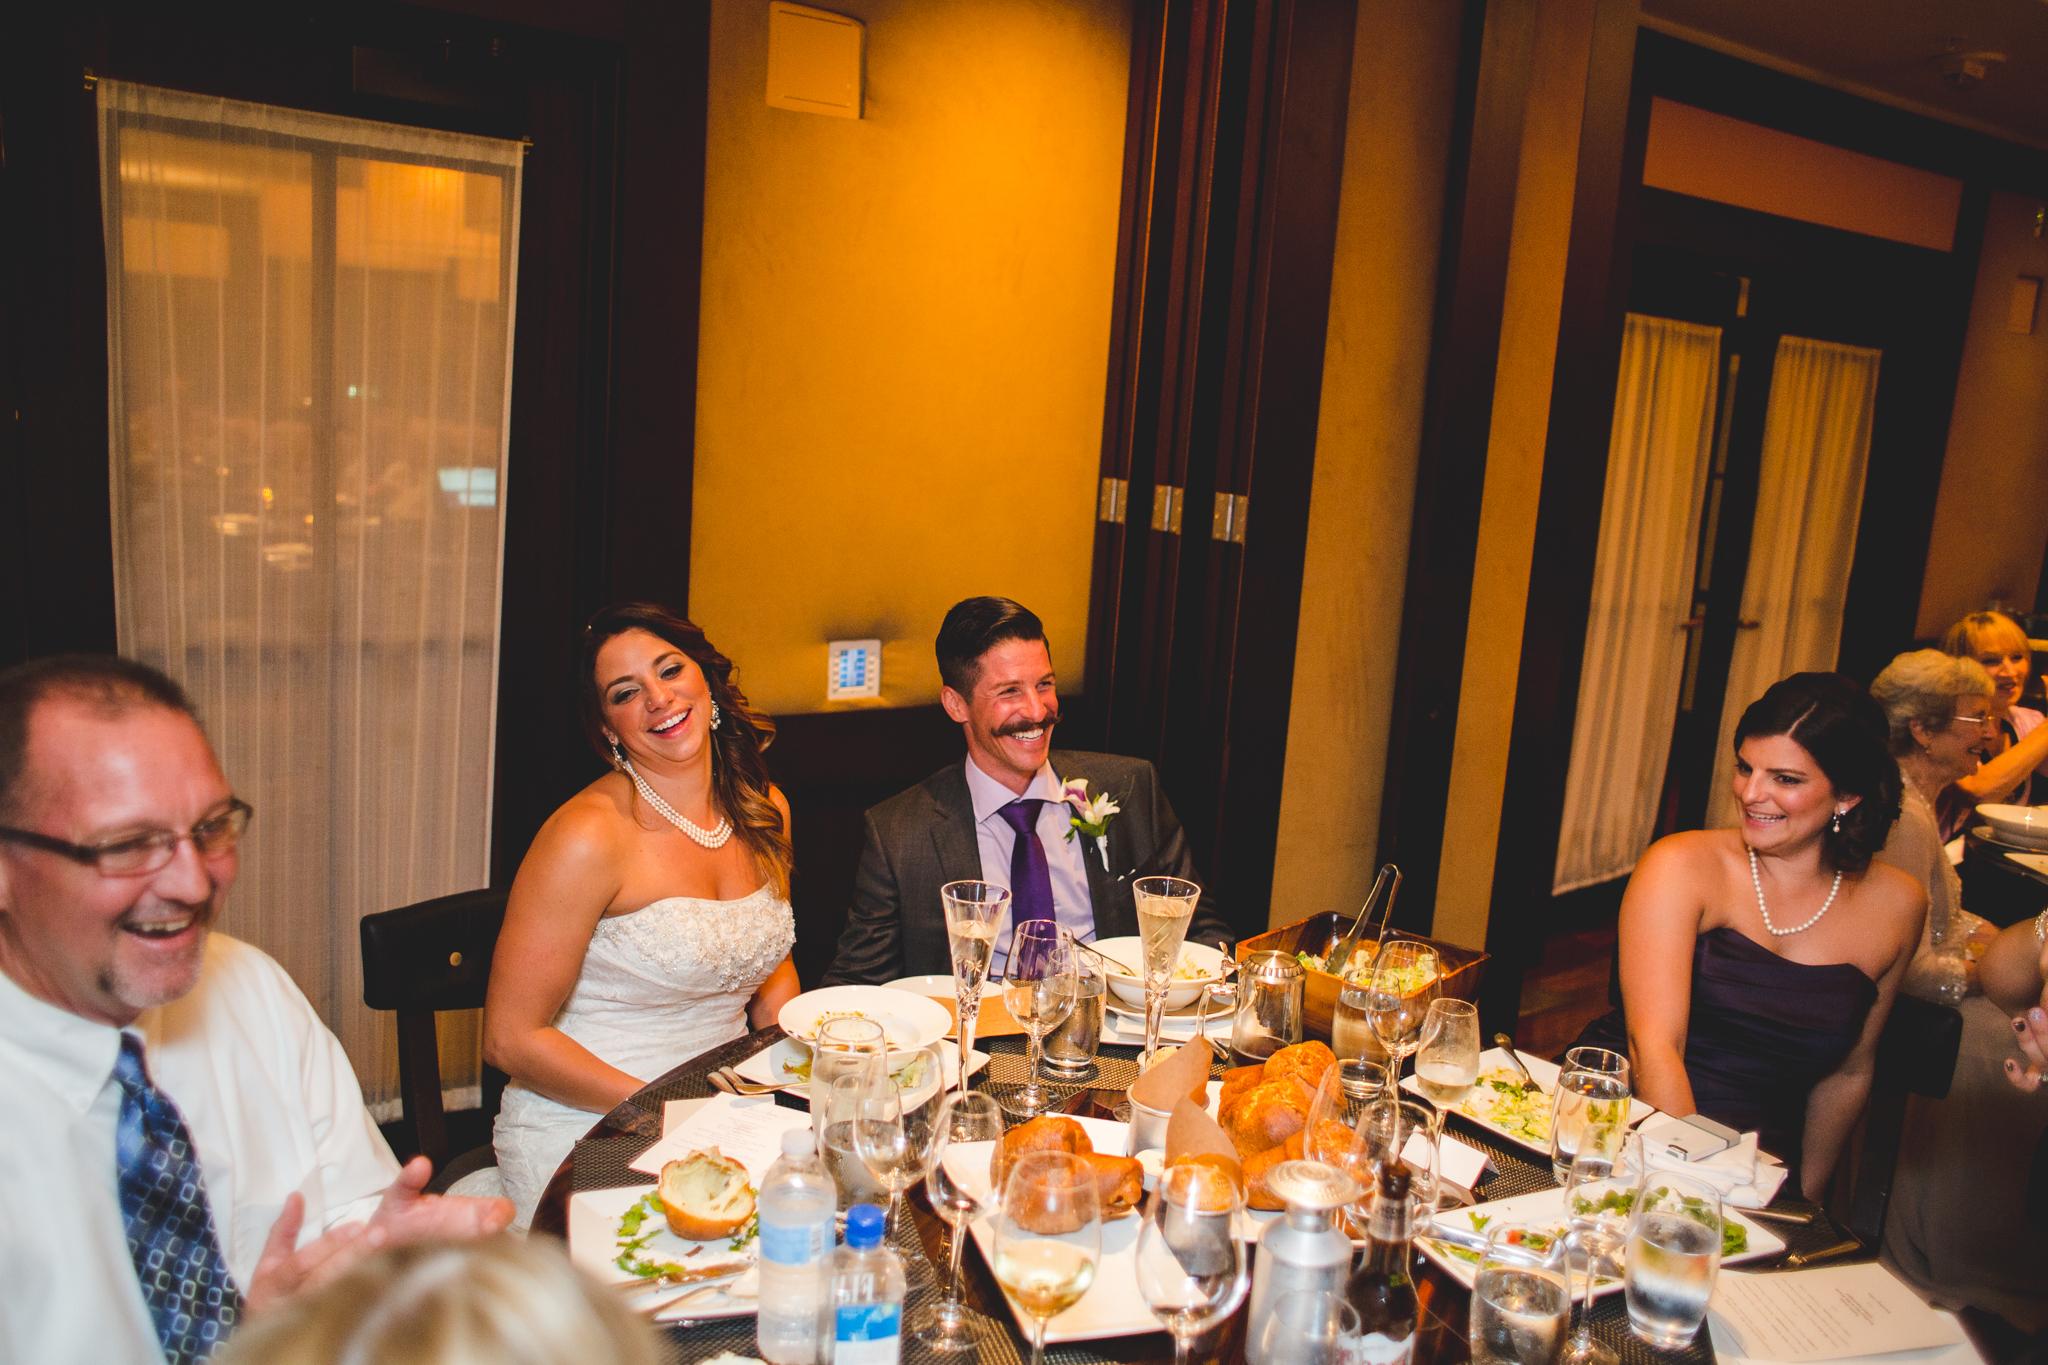 lori bride laughs during reception